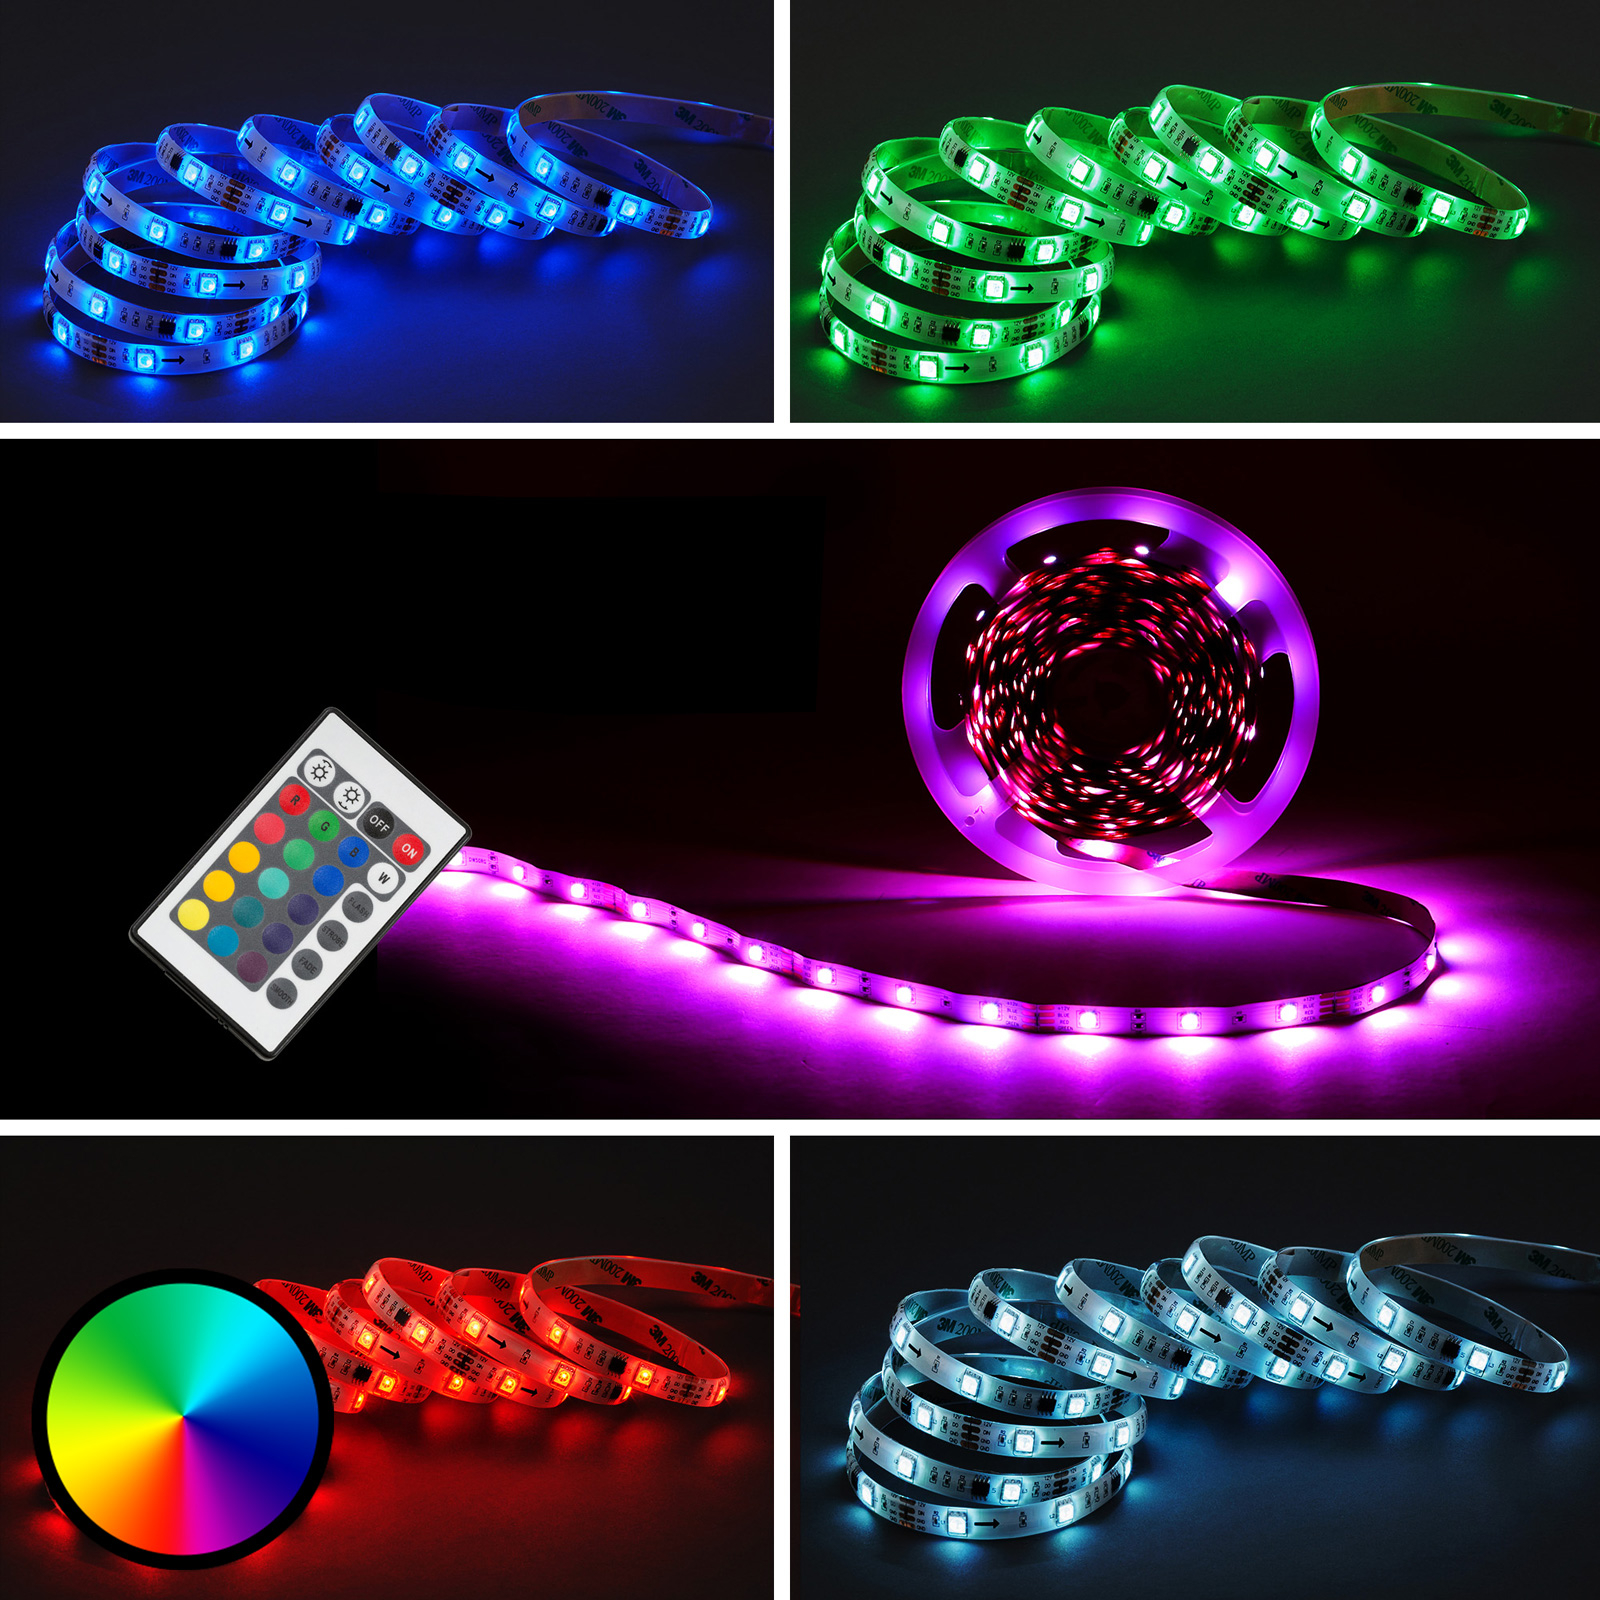 2024-300 LED strip RGB indoors 10 m remote_1510492_1